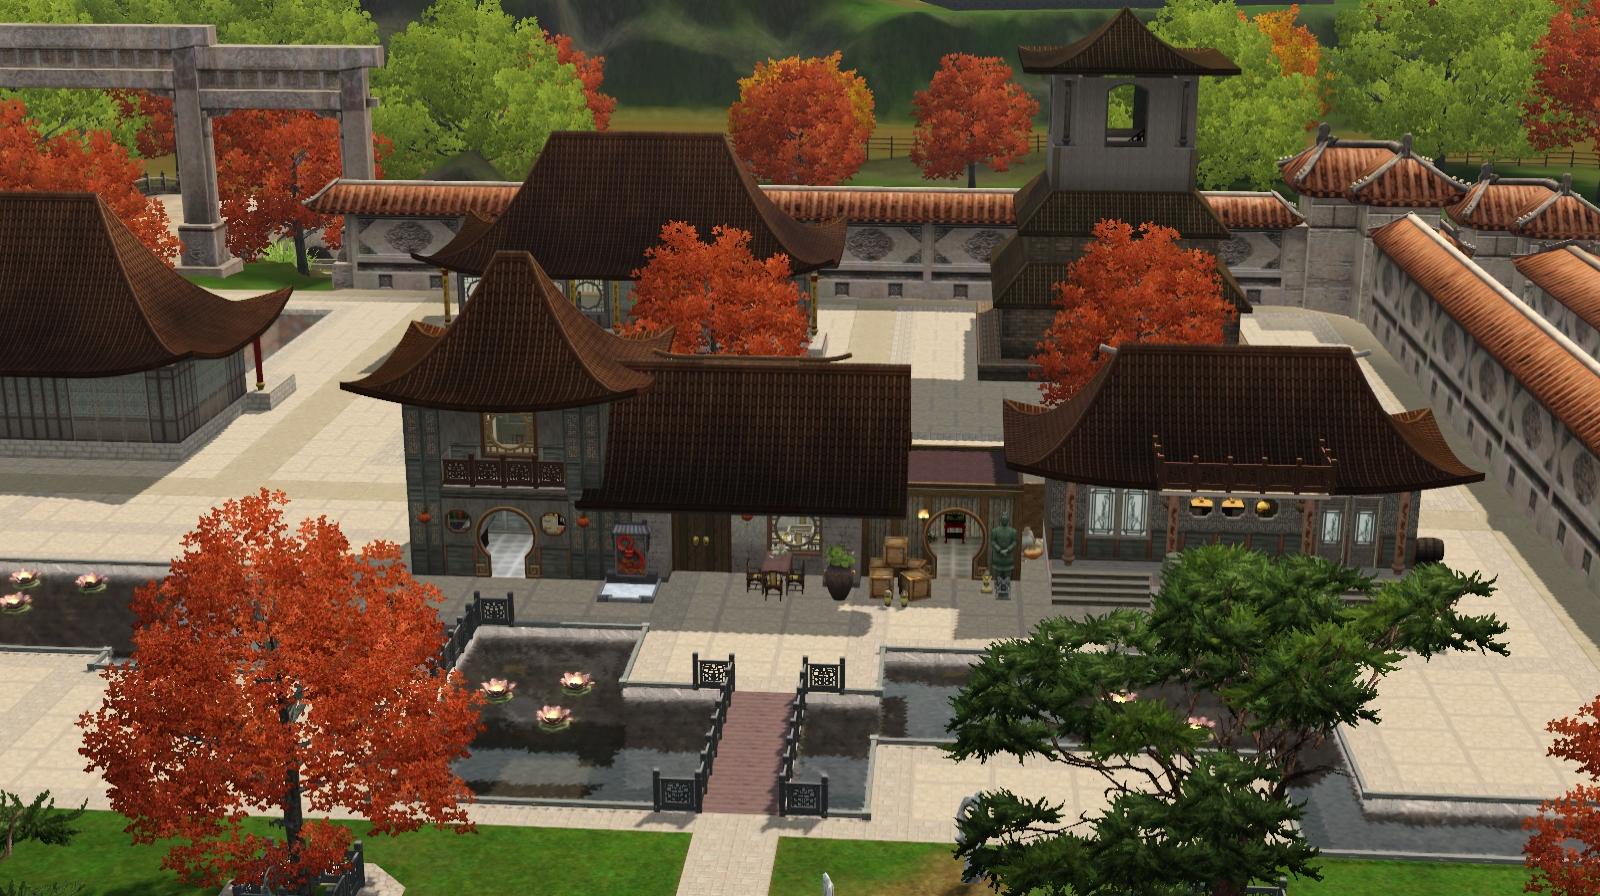 sims 3 community lots compendium sims 3 markets. Black Bedroom Furniture Sets. Home Design Ideas